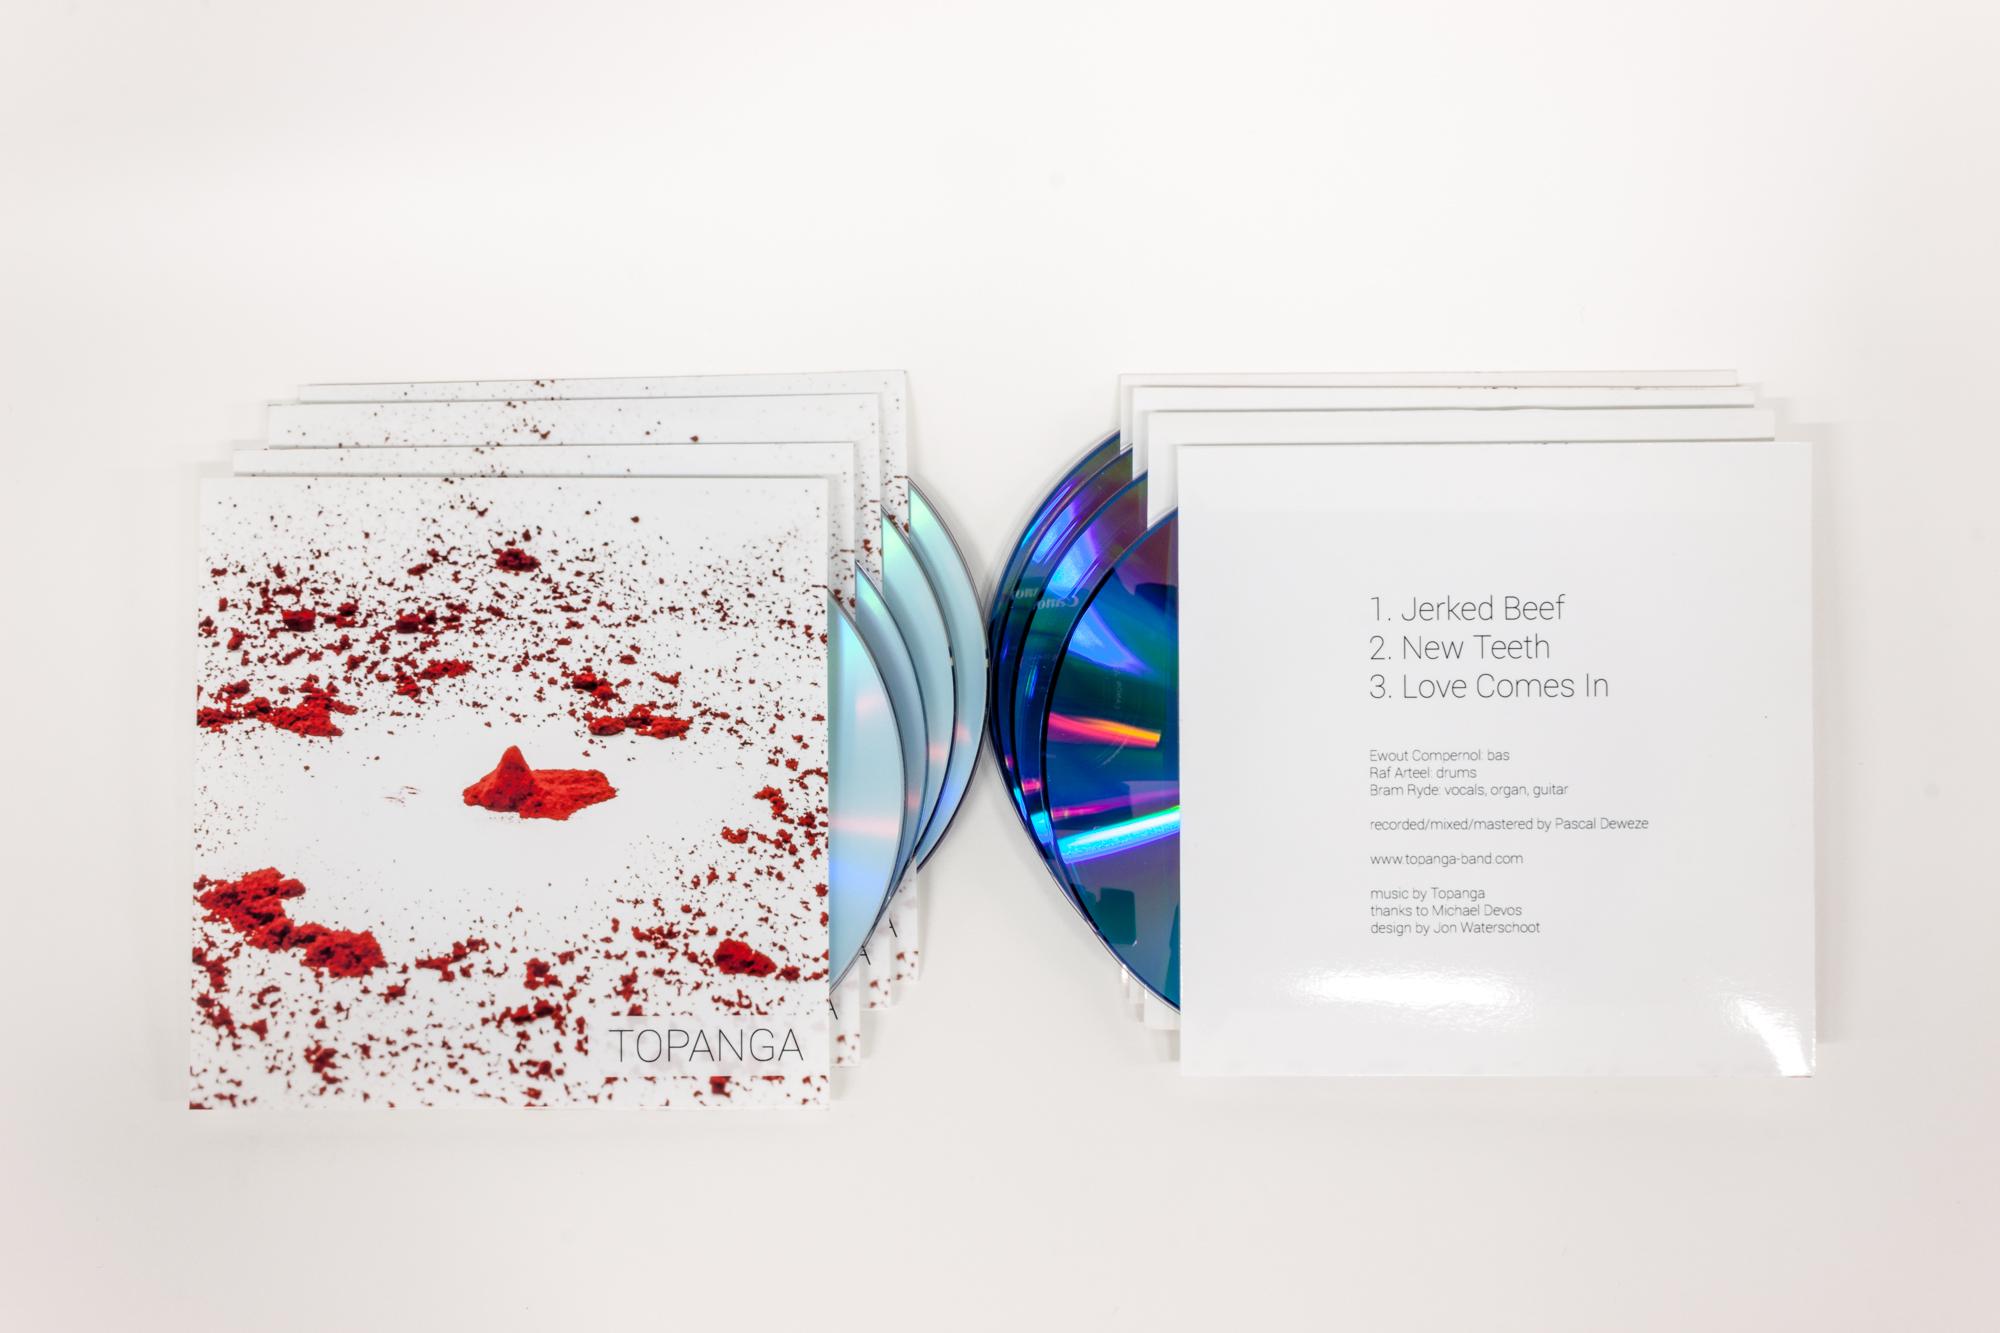 Topanga - CD EP design